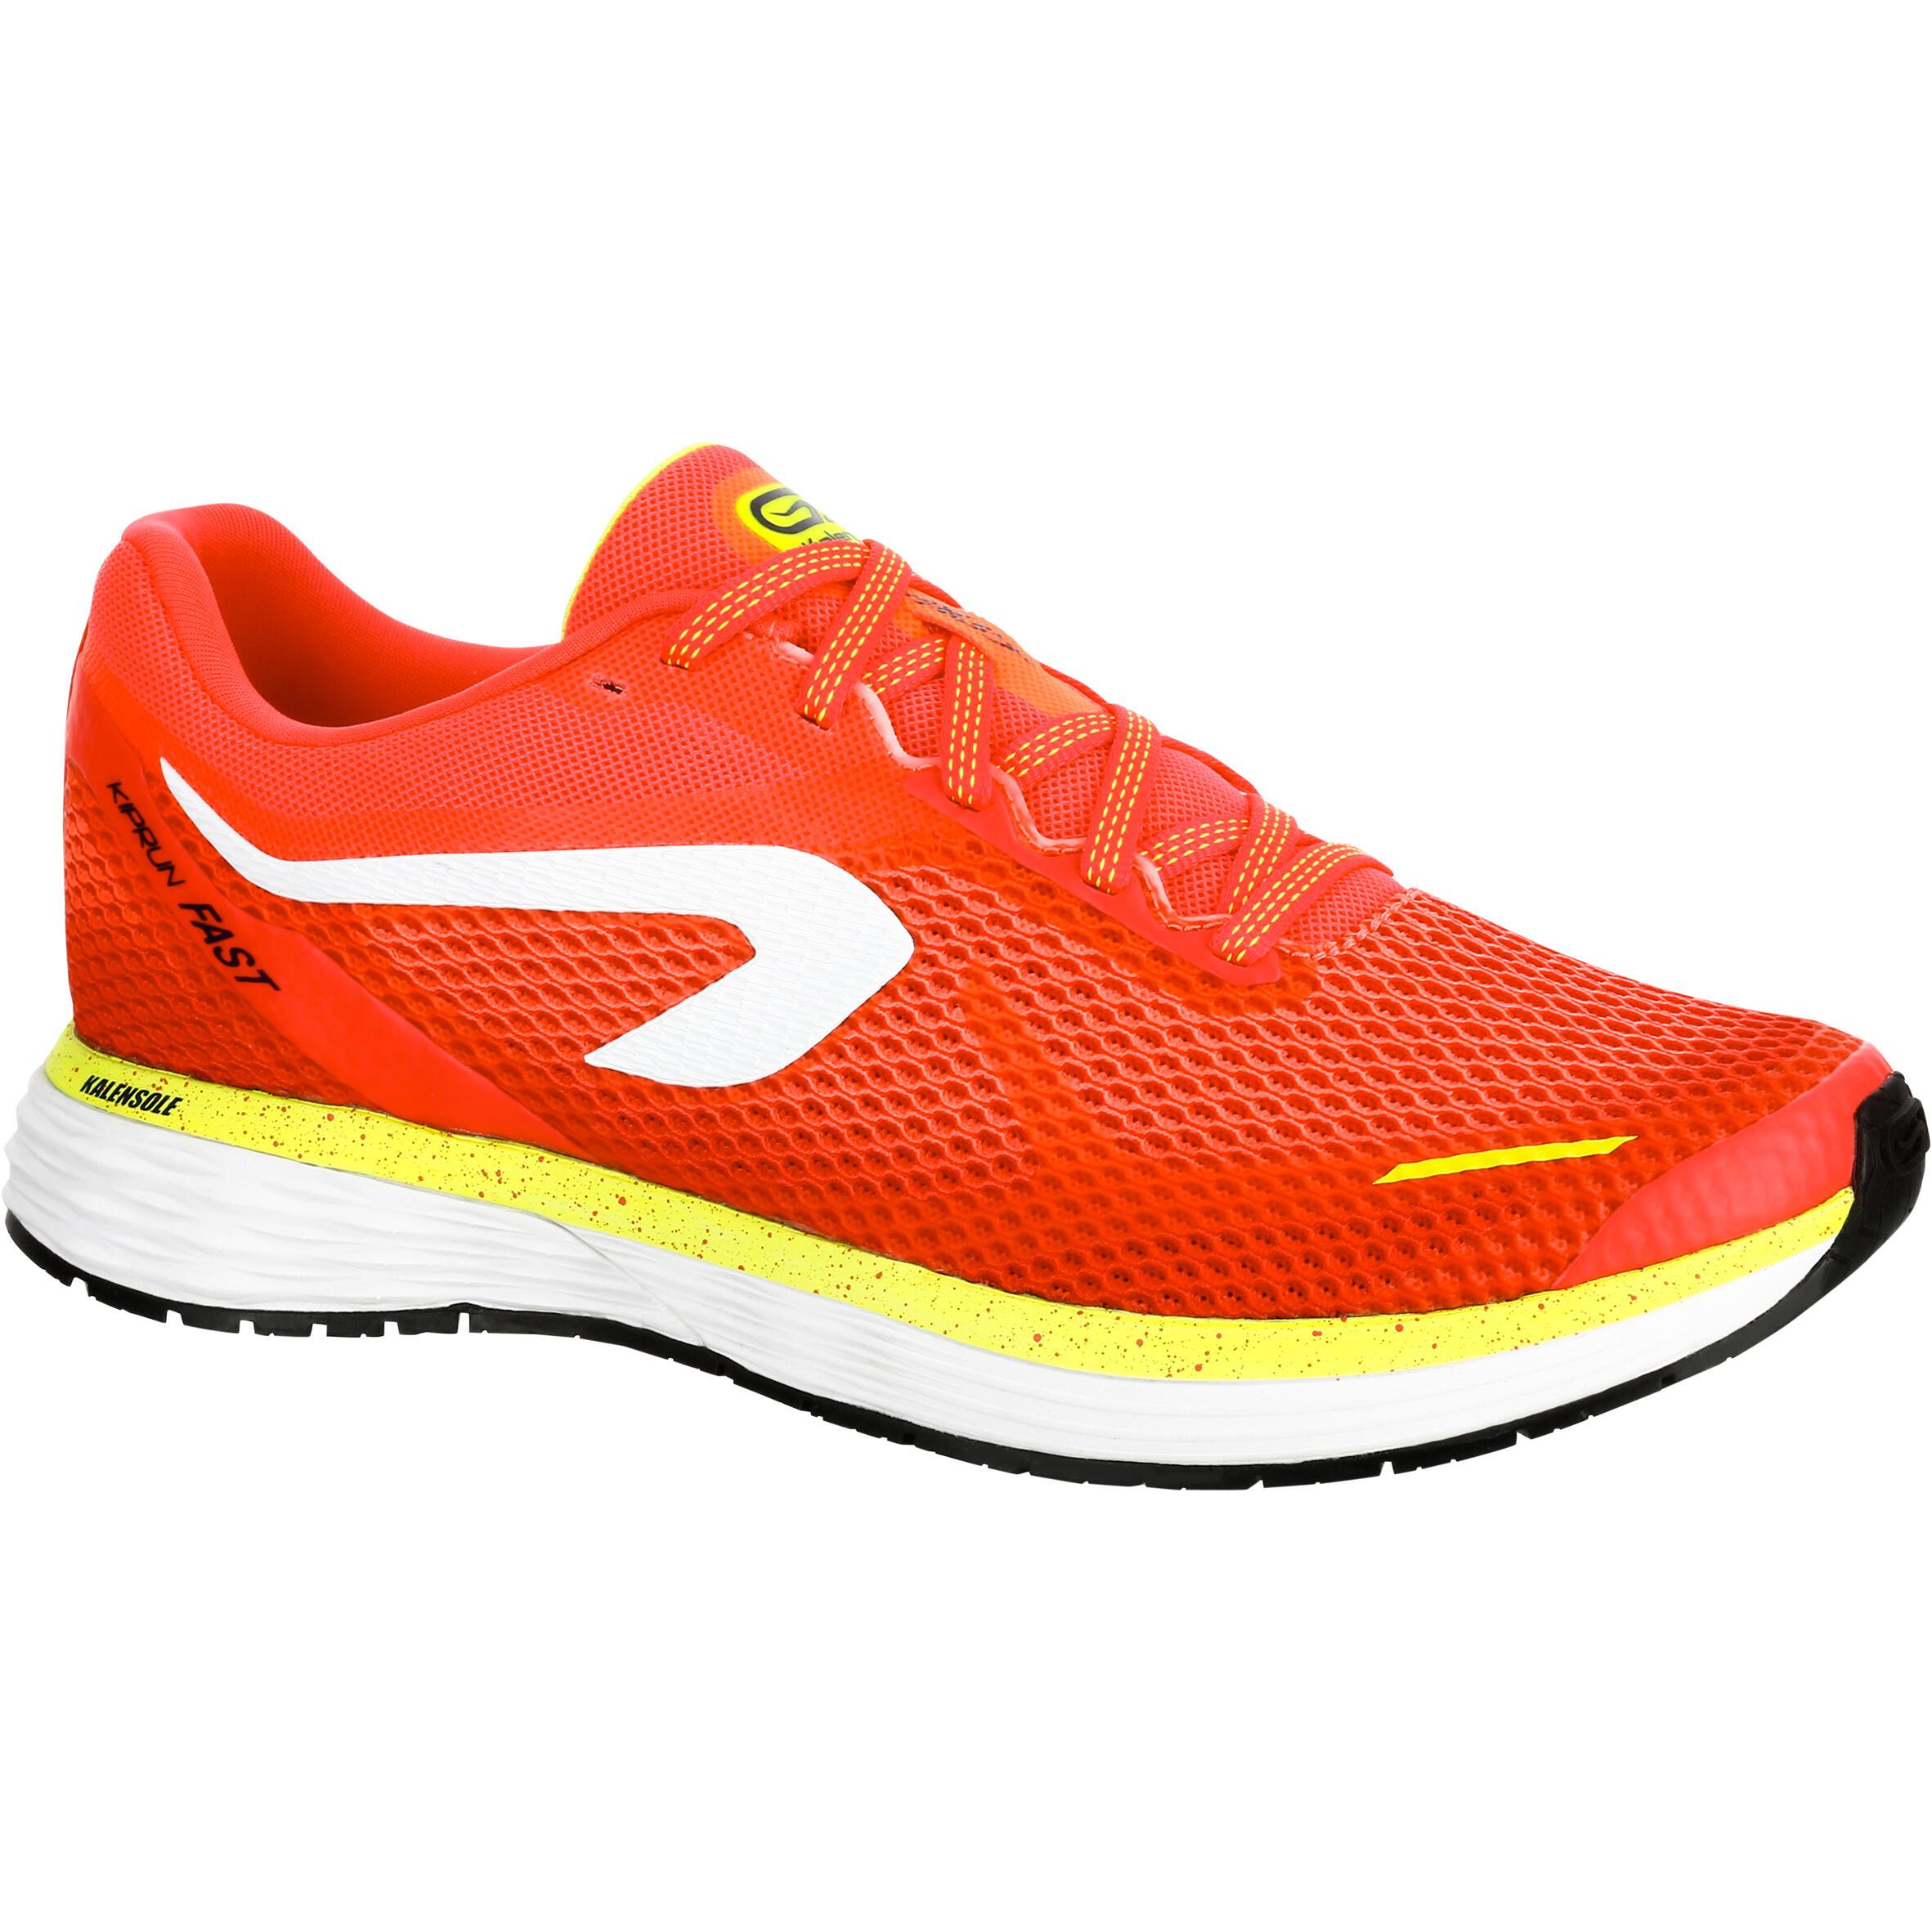 2501876 Kalenji Hardloopschoenen voor dames Kalenji Kiprun Fast koraalrood geel